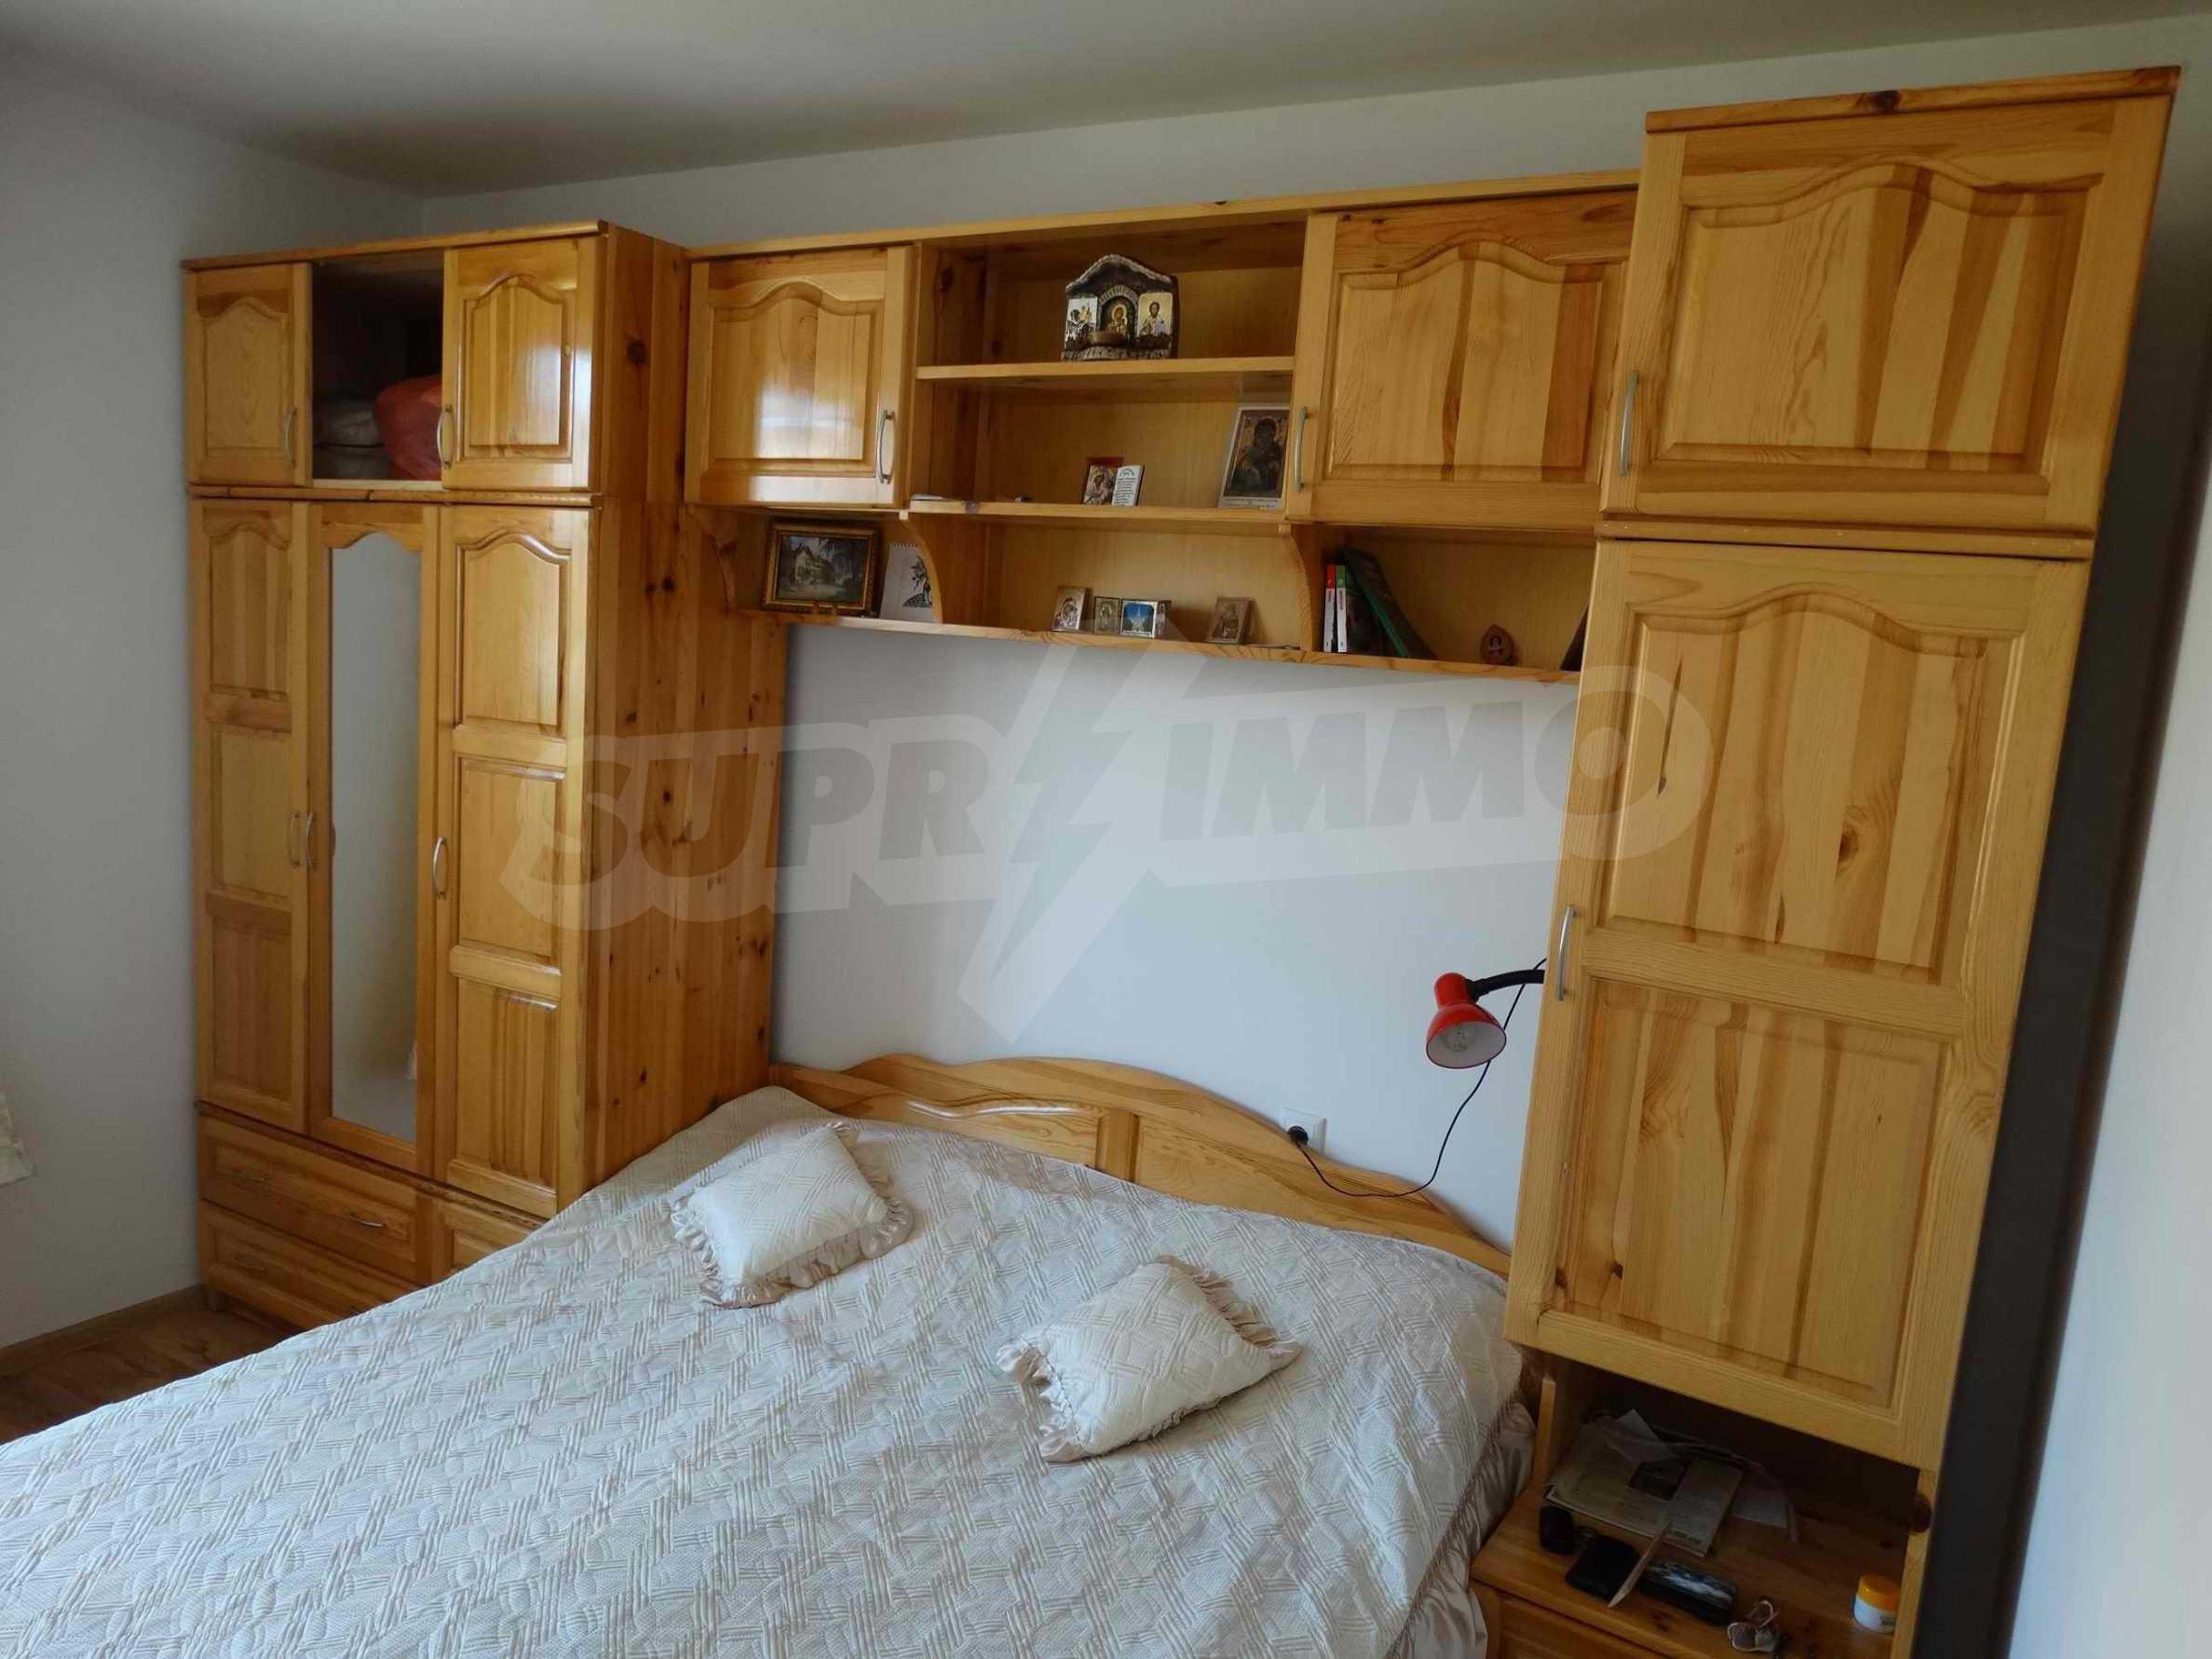 Тристаен апартамент близо до плажа в Бяла 7